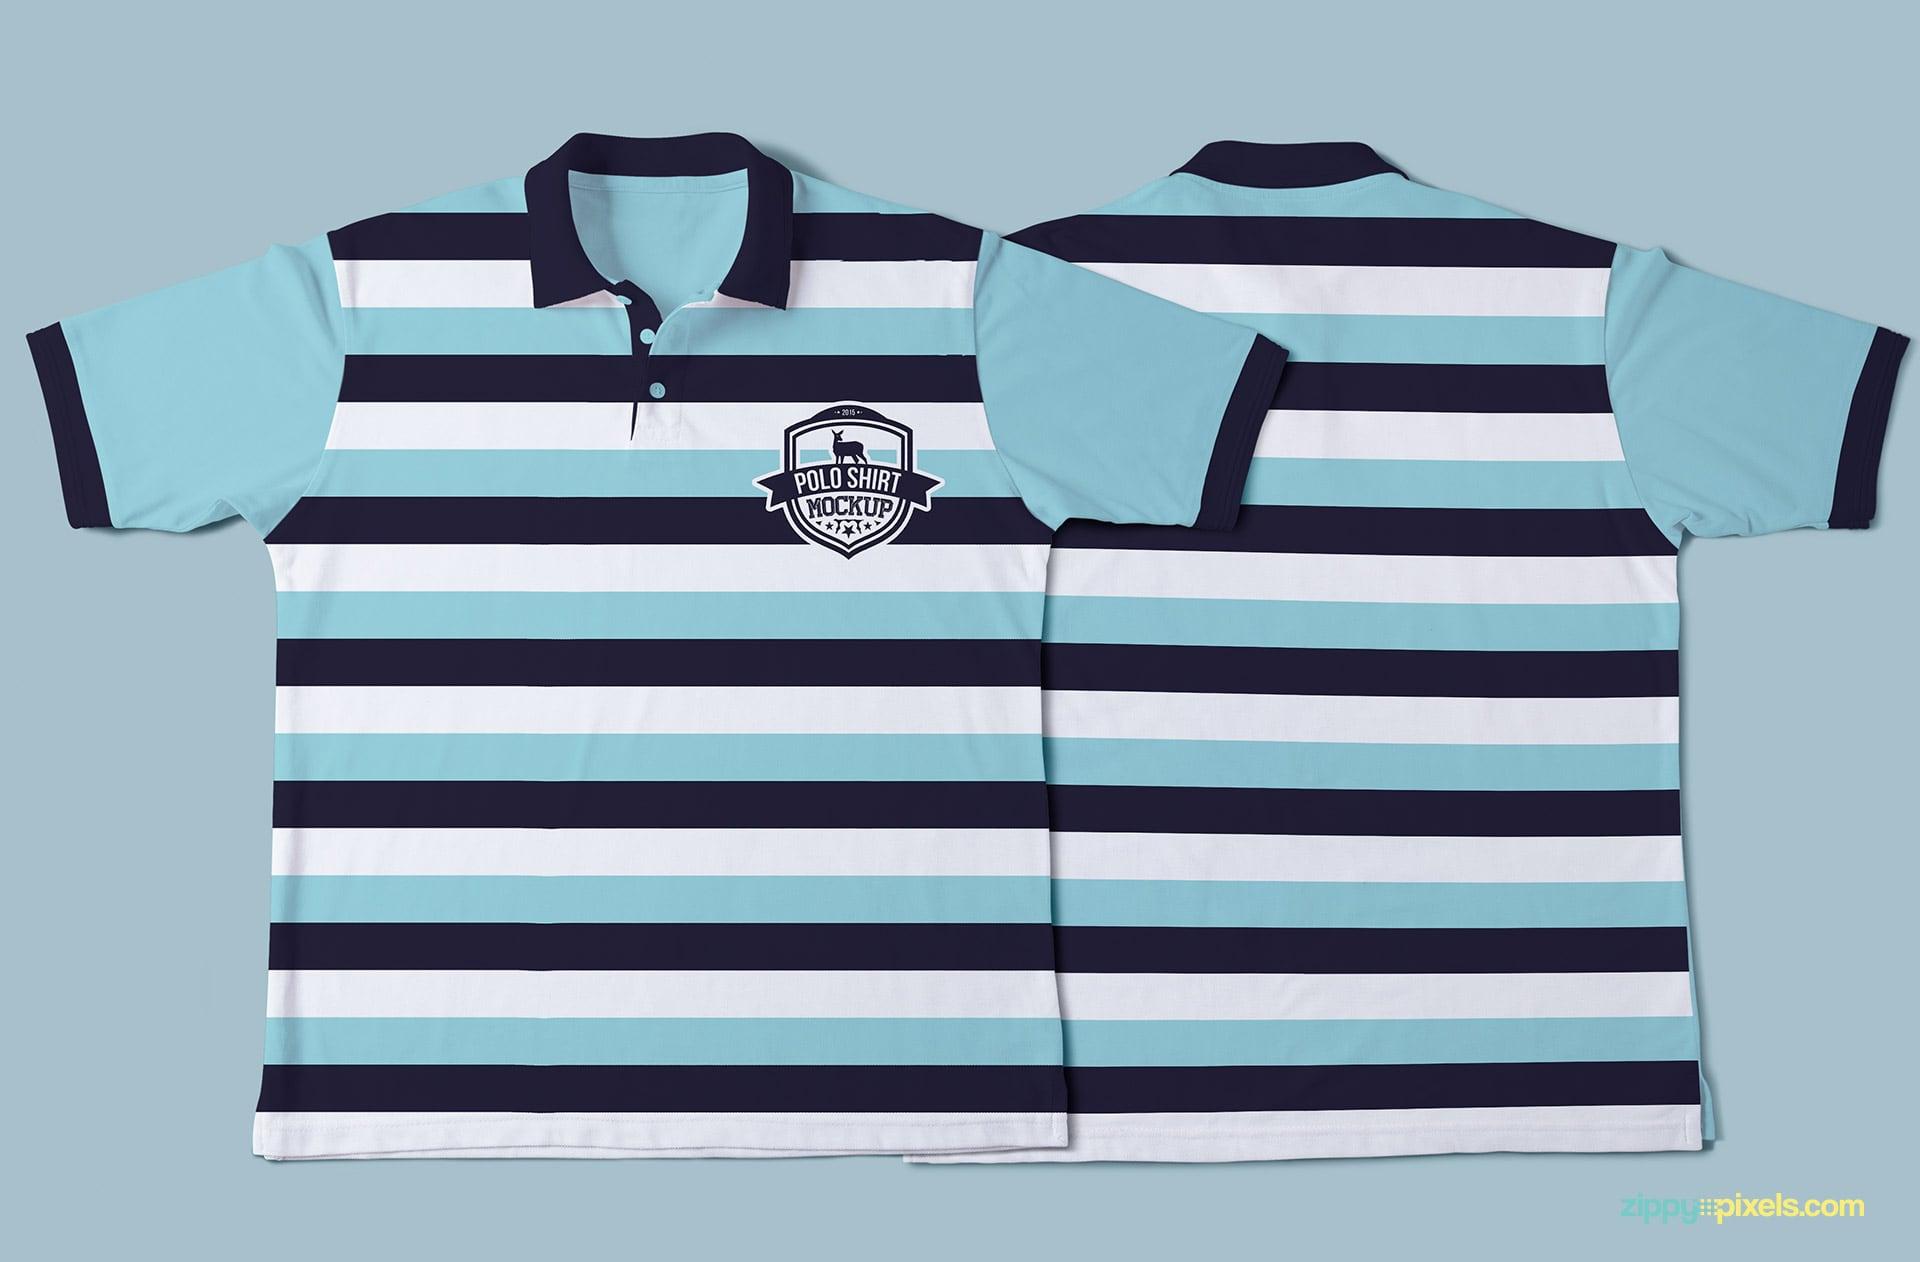 Amazing polo shirt mockup